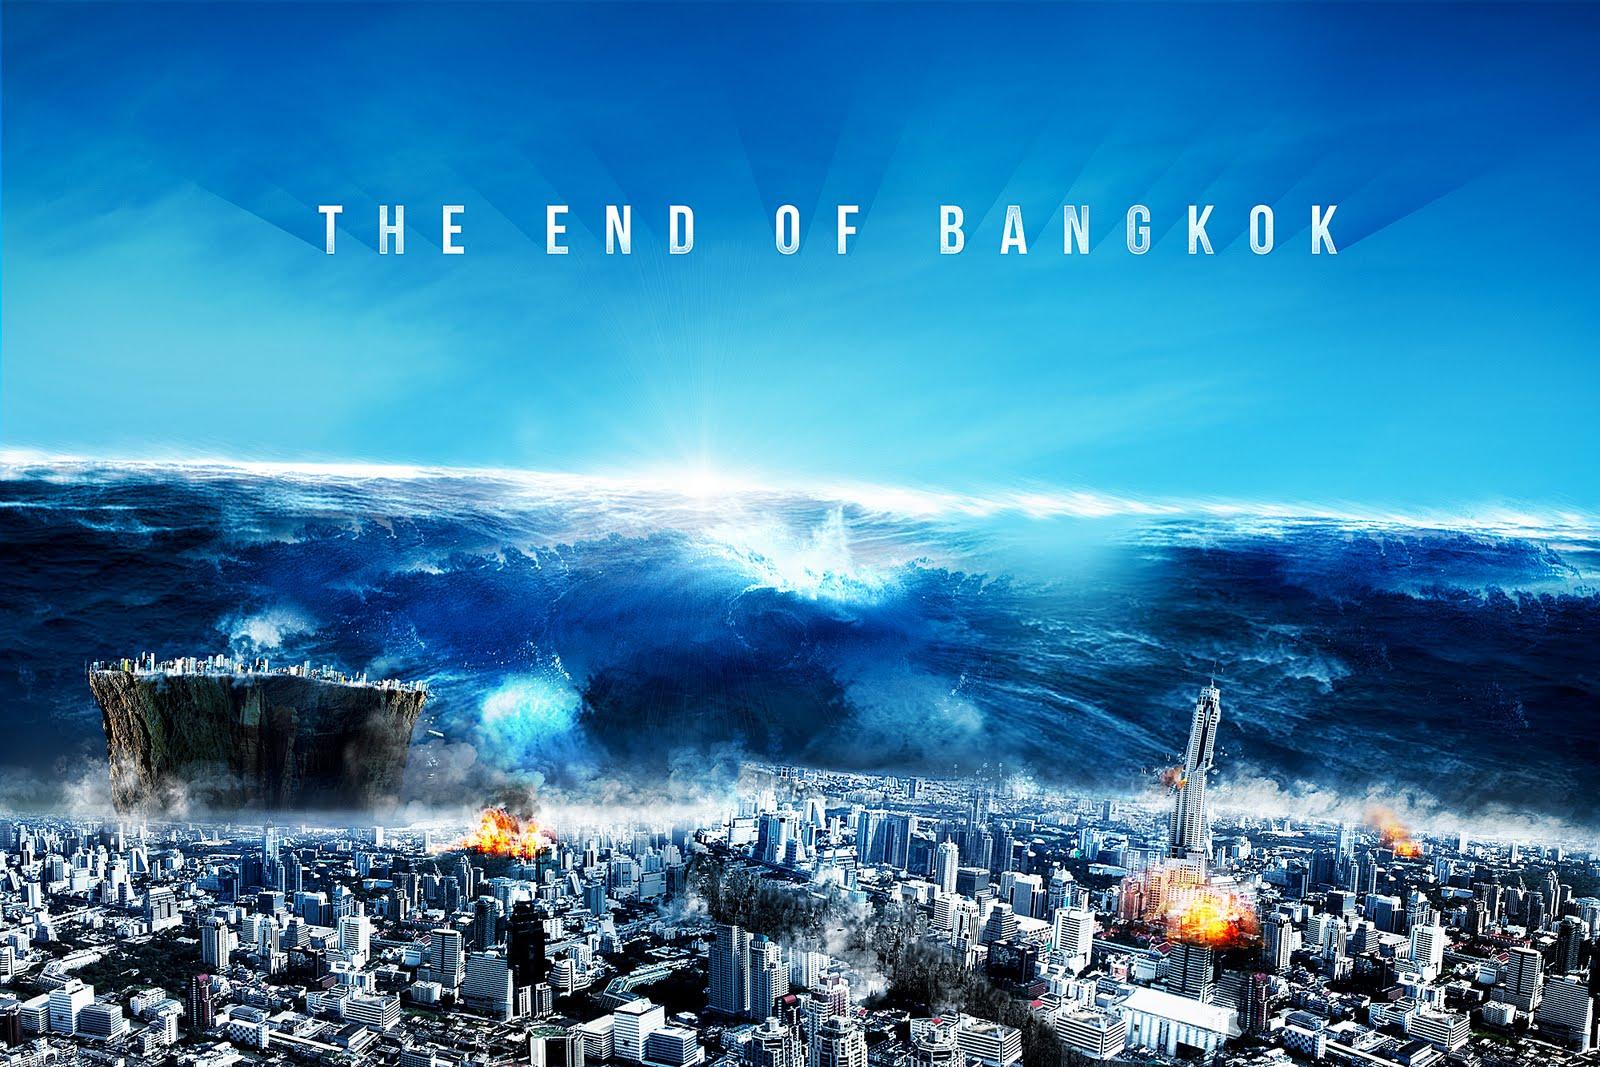 Thailand tidal wave movie : Transformers movie videos download